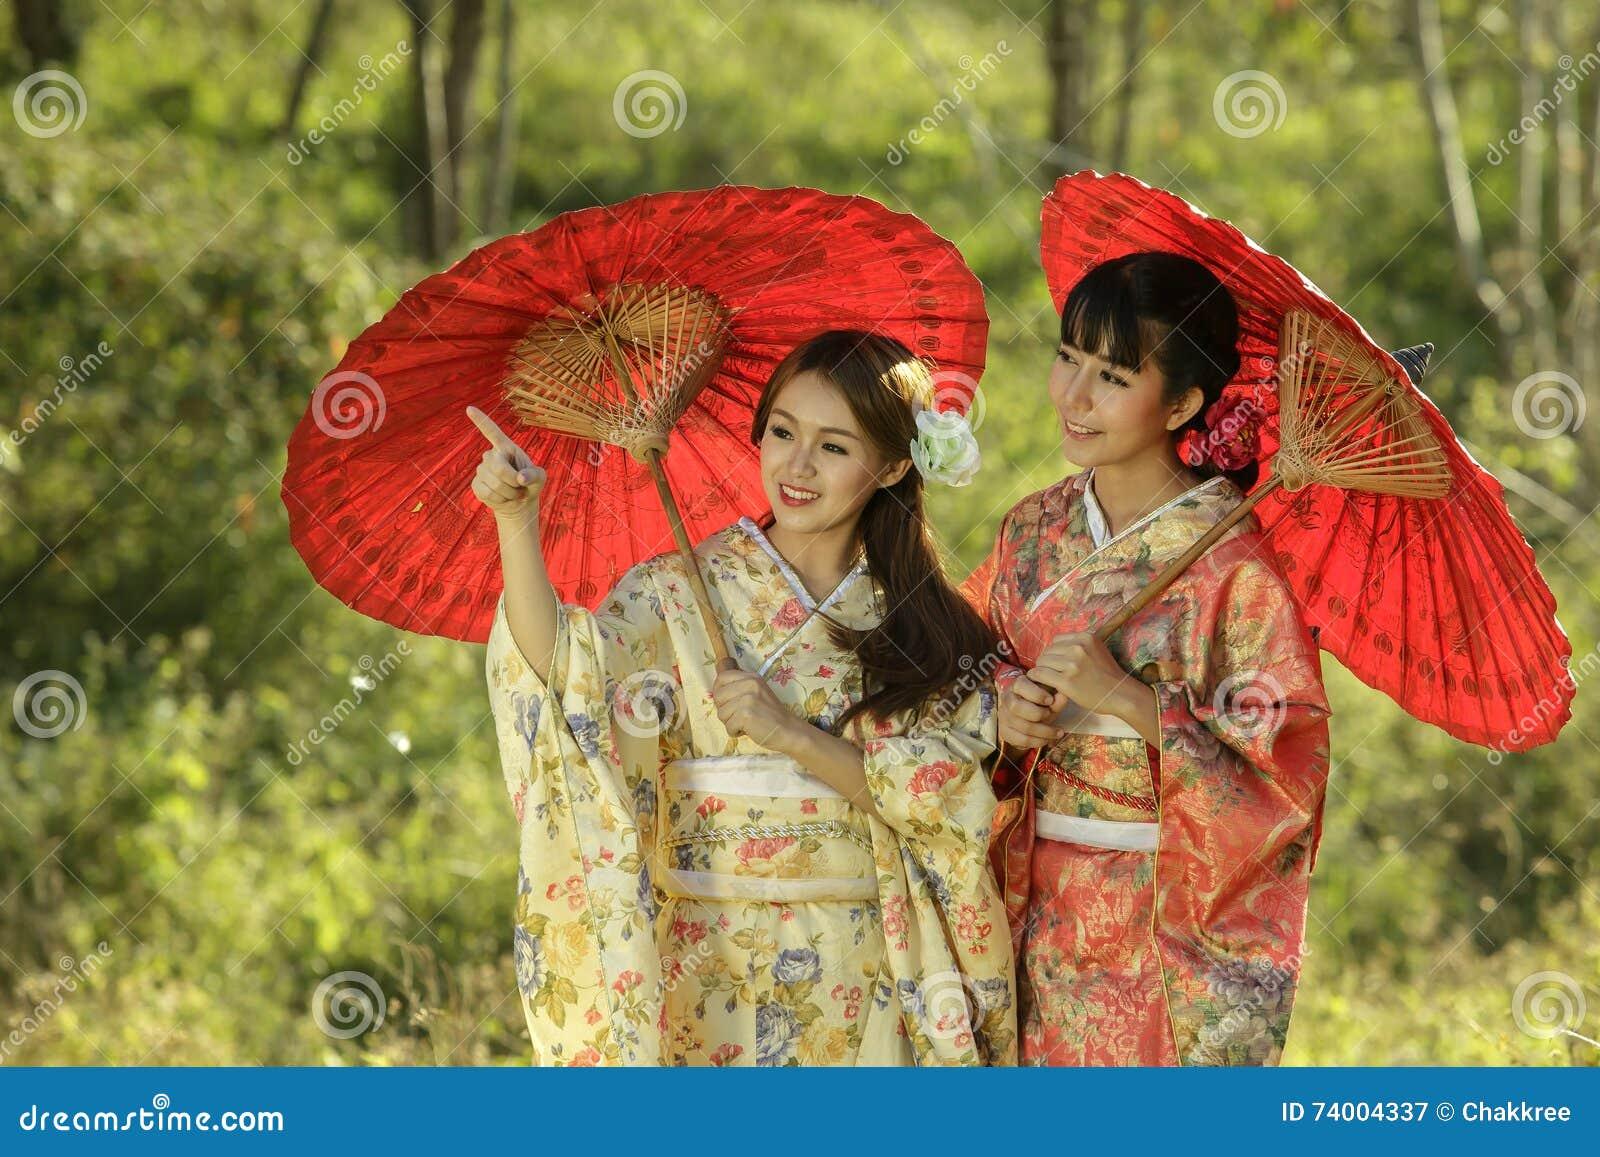 04b296ee06839 Couple asian women wearing traditional japanese kimono and red umbrella in  the himalayan sakura garden